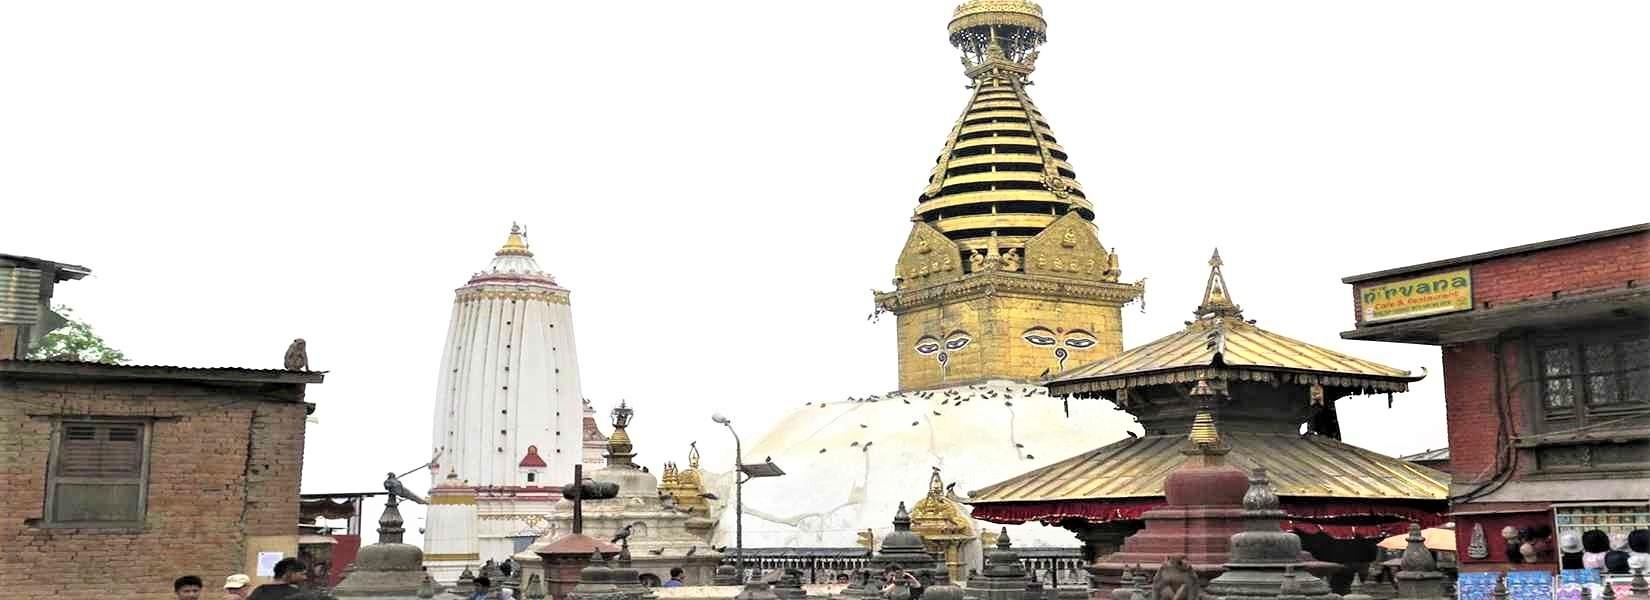 Top 5 Tour Destination in Nepal